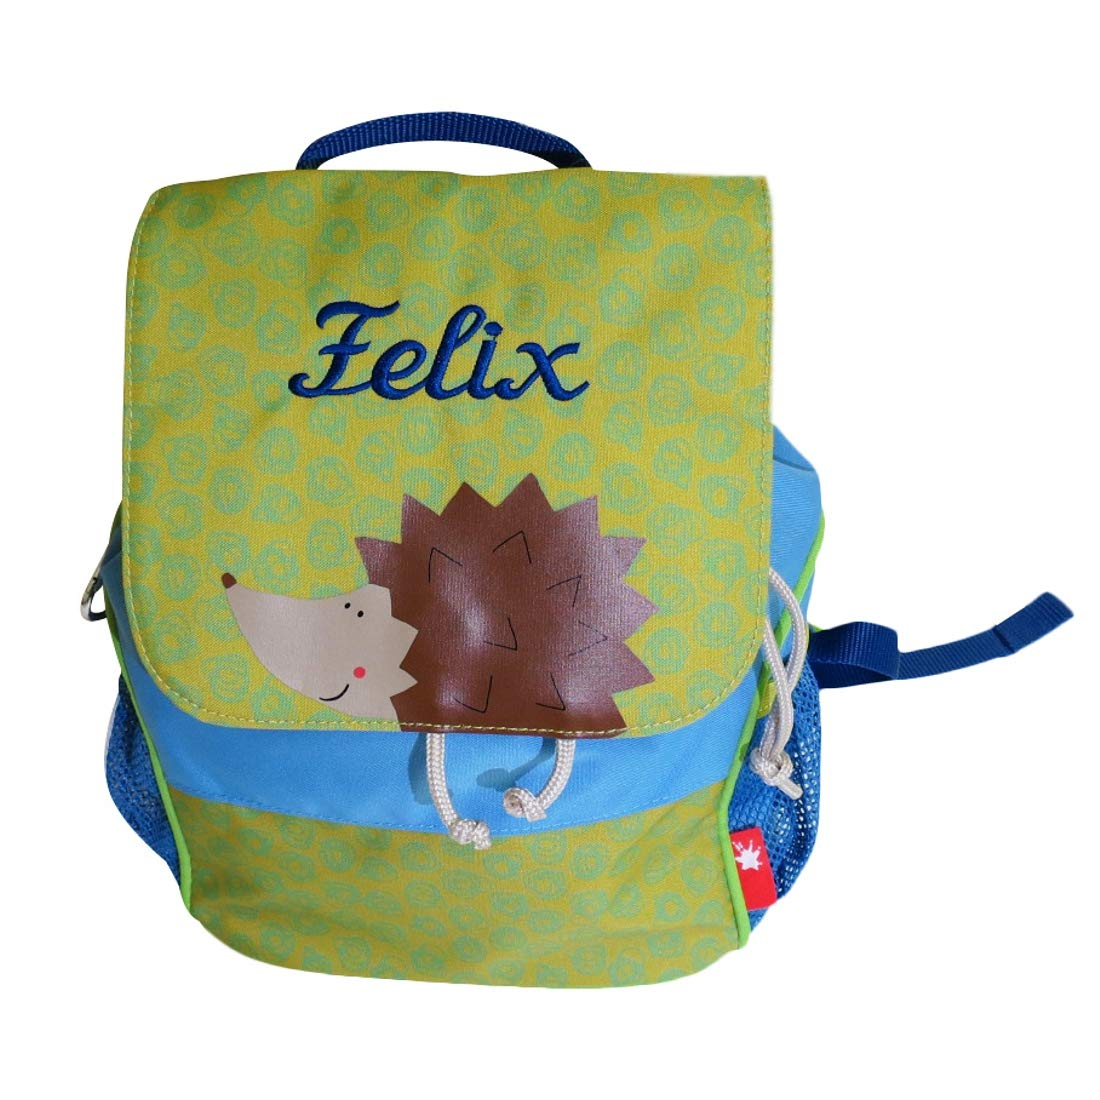 Sigikid Kinder Kinder Kinder Rucksack Igel mit Namen Besteickt grün blau 28 cm x 16 cm x 24 cm für Kindergarten Kita f553d3